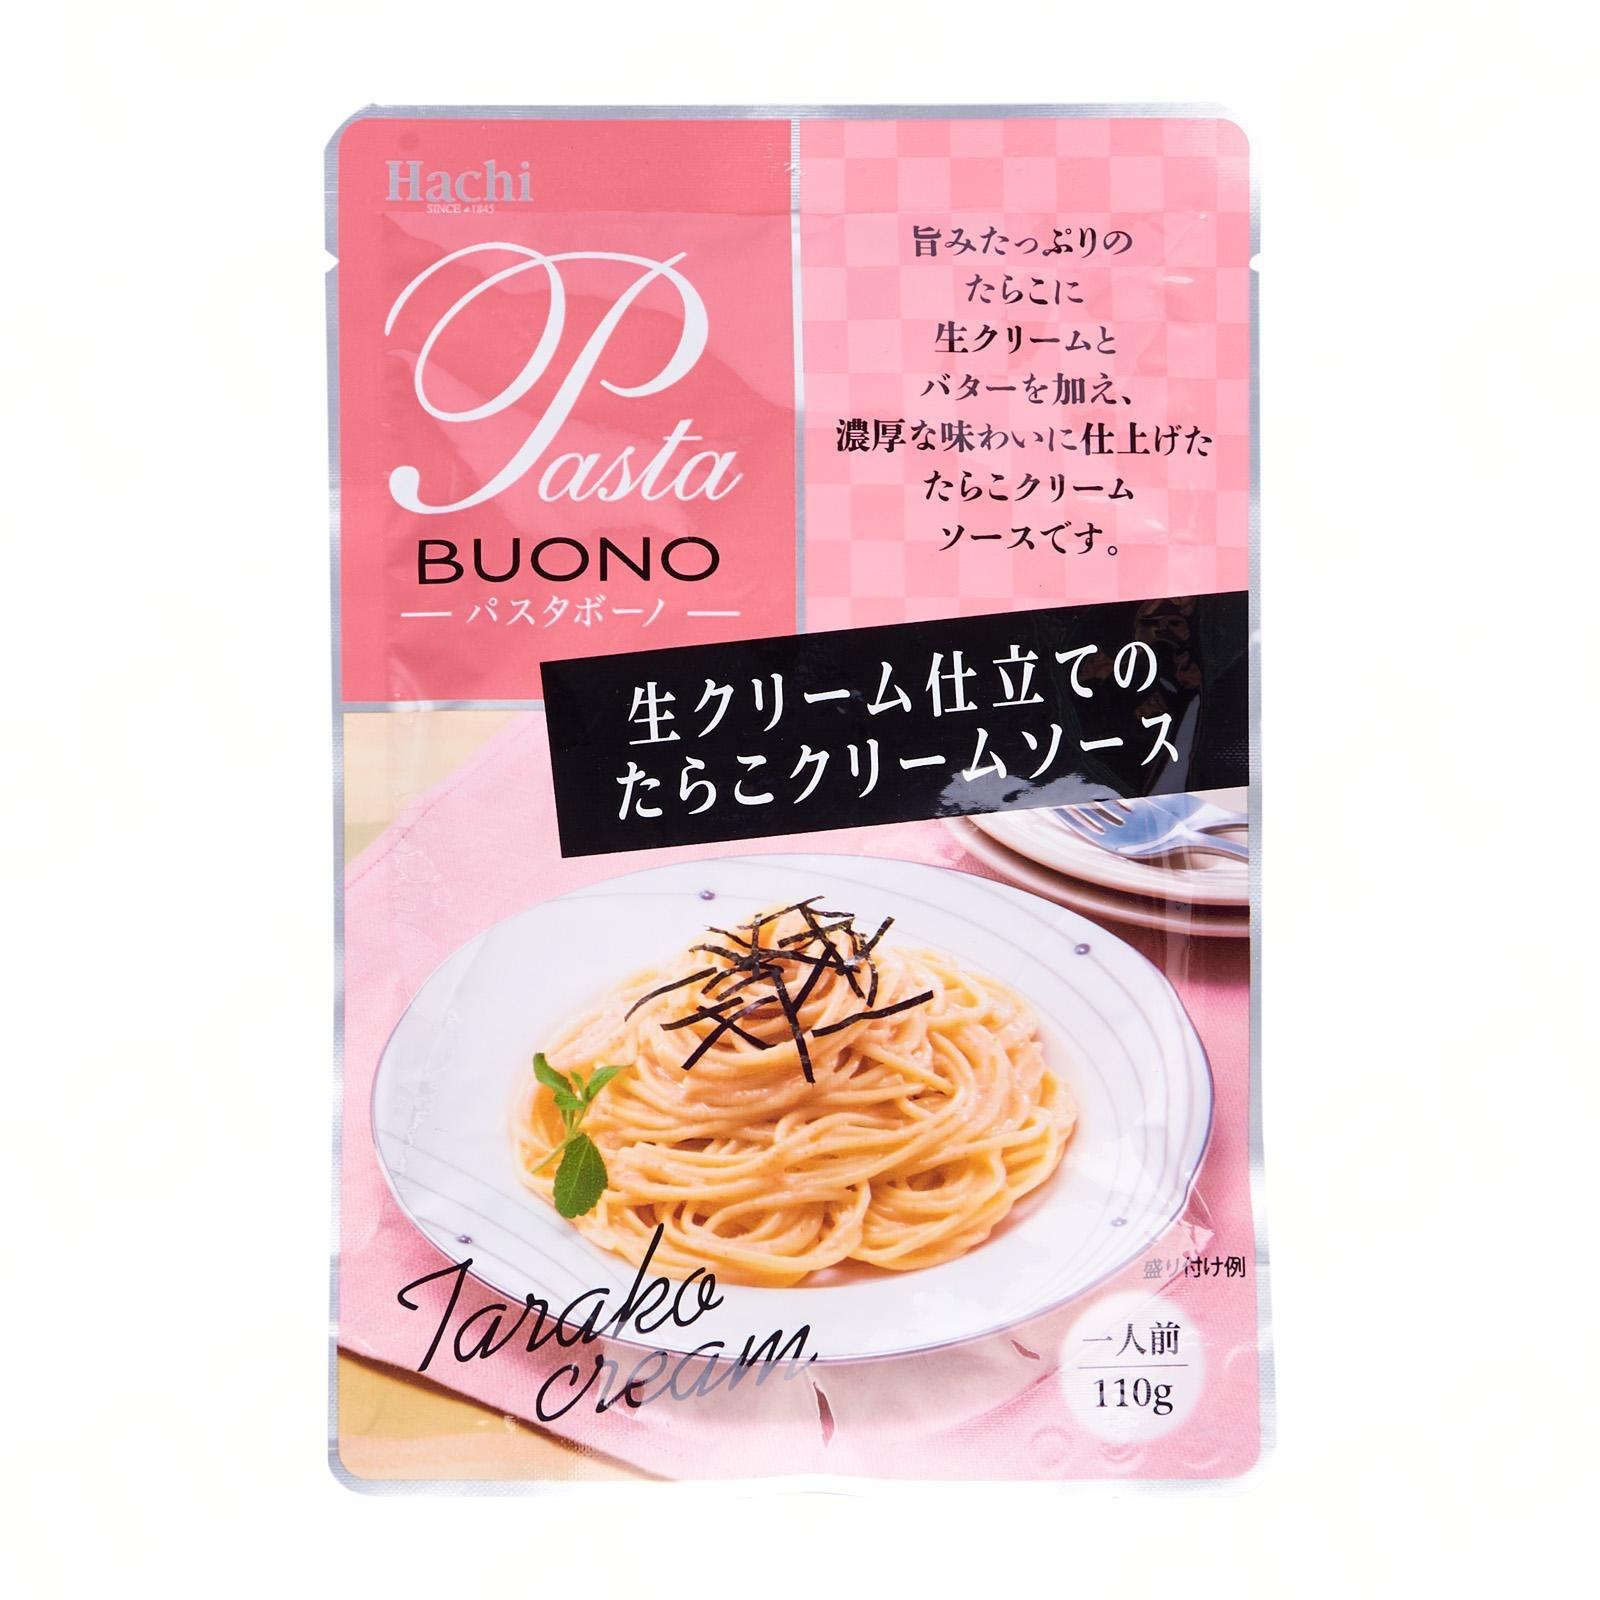 Kirei Hachi Tarako Japanese Cod Roe Cream Pasta Sauce